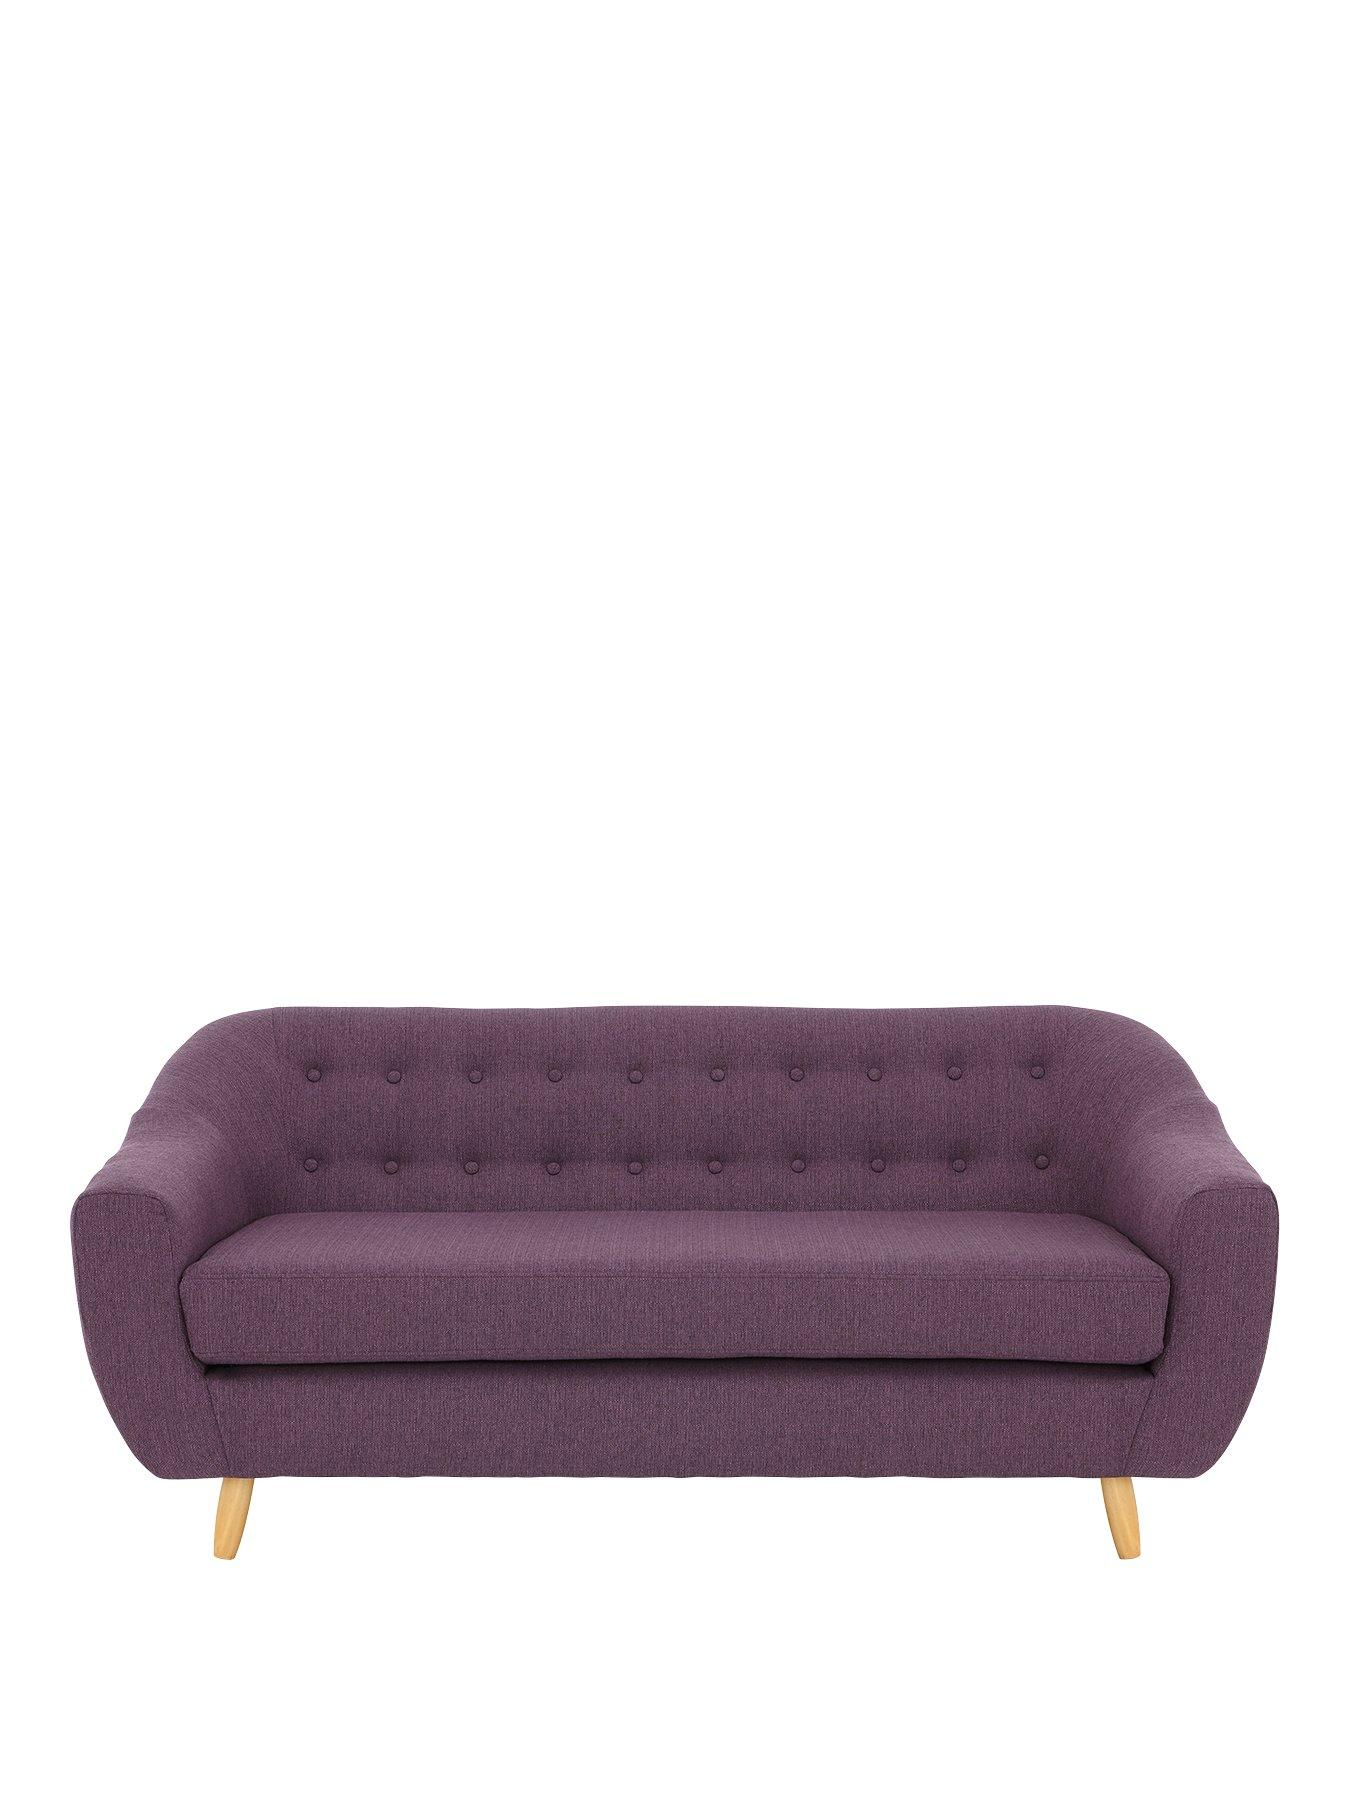 plum sofas uk craftmaster sofa fabrics claudia 3 seater fabric very co